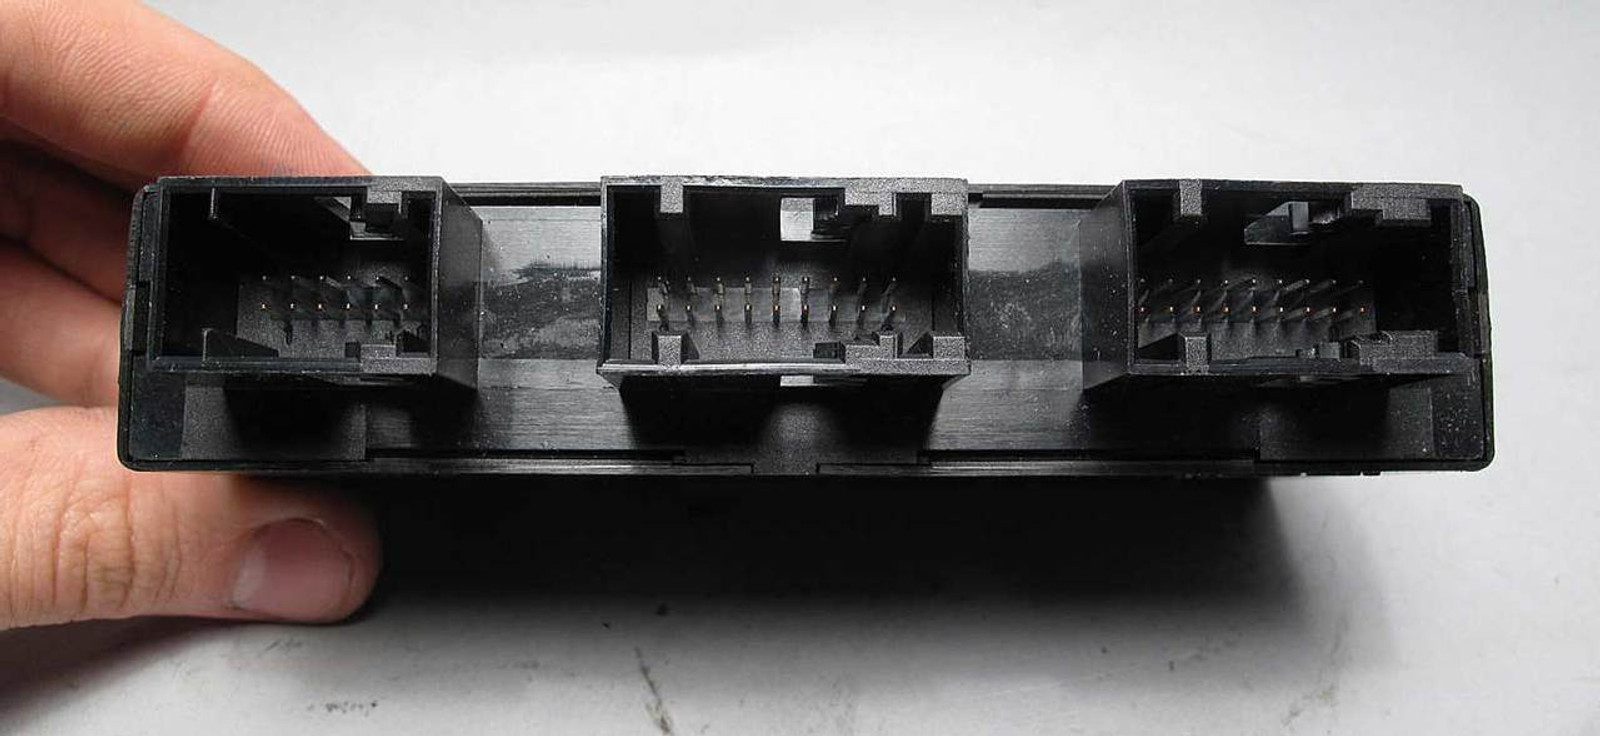 BMW Parking Distance Control Sensor Module PDC 2004-2010 E60 E63 E65 X5 RR OEM